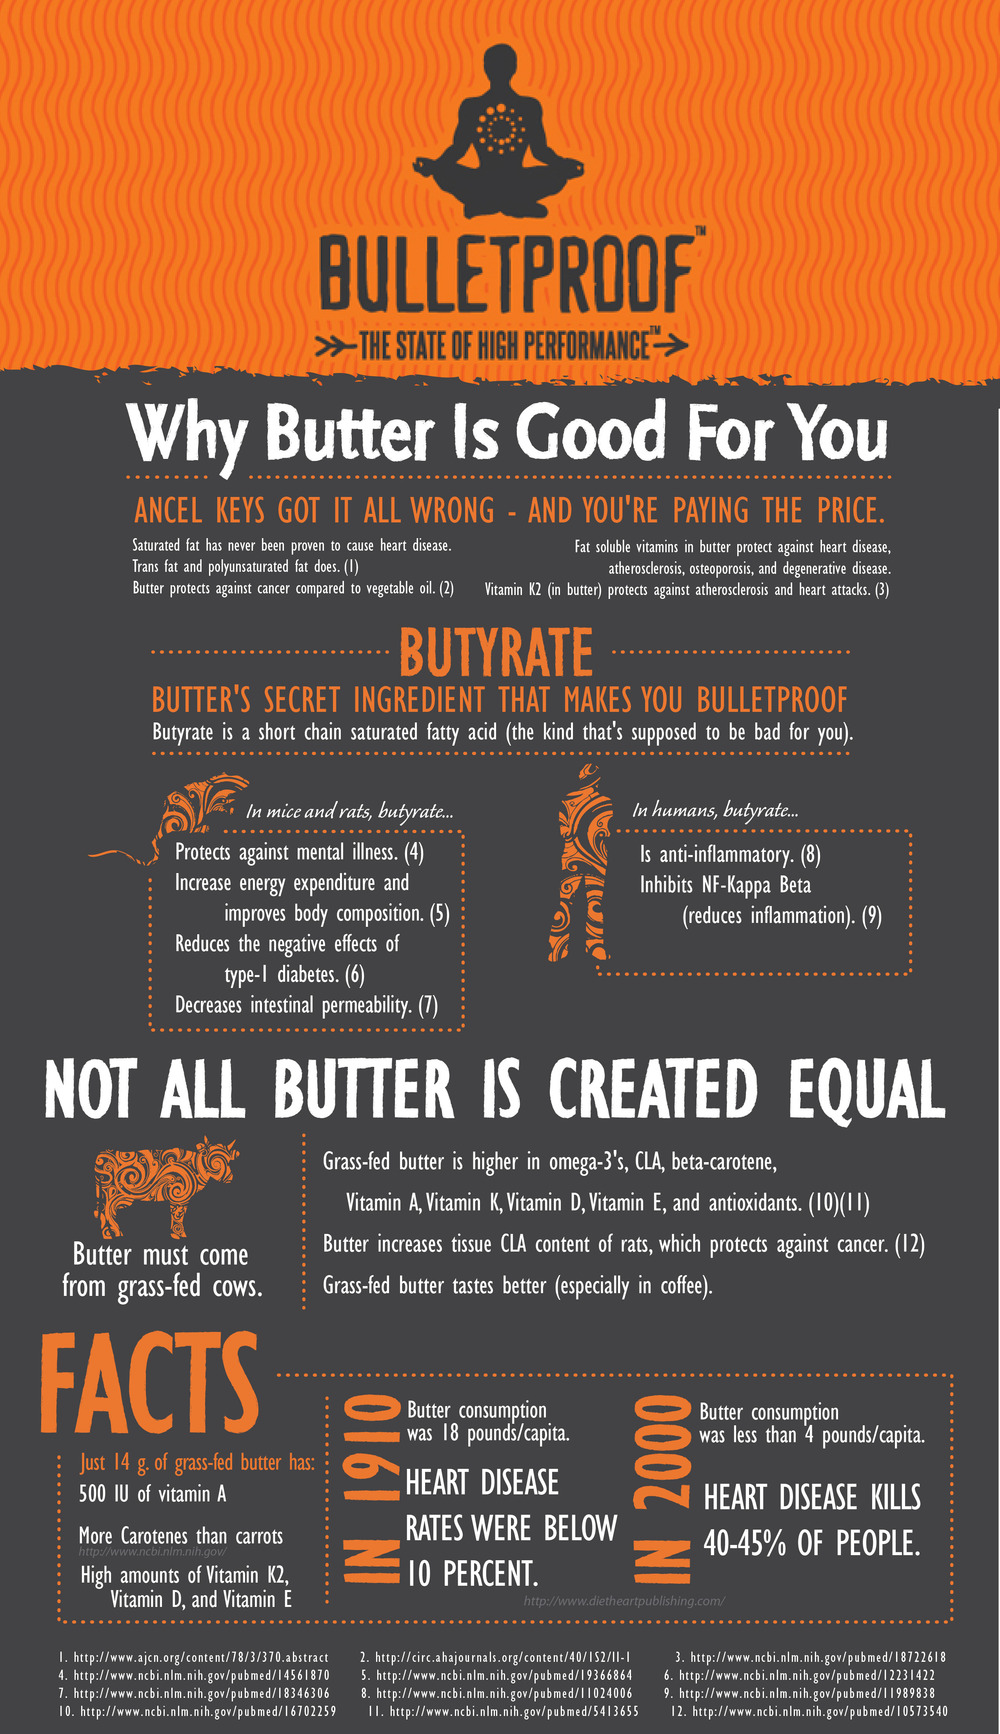 http://www.bulletproofexec.com/wp-content/uploads/2012/04/Butter-Infographic1.jpg